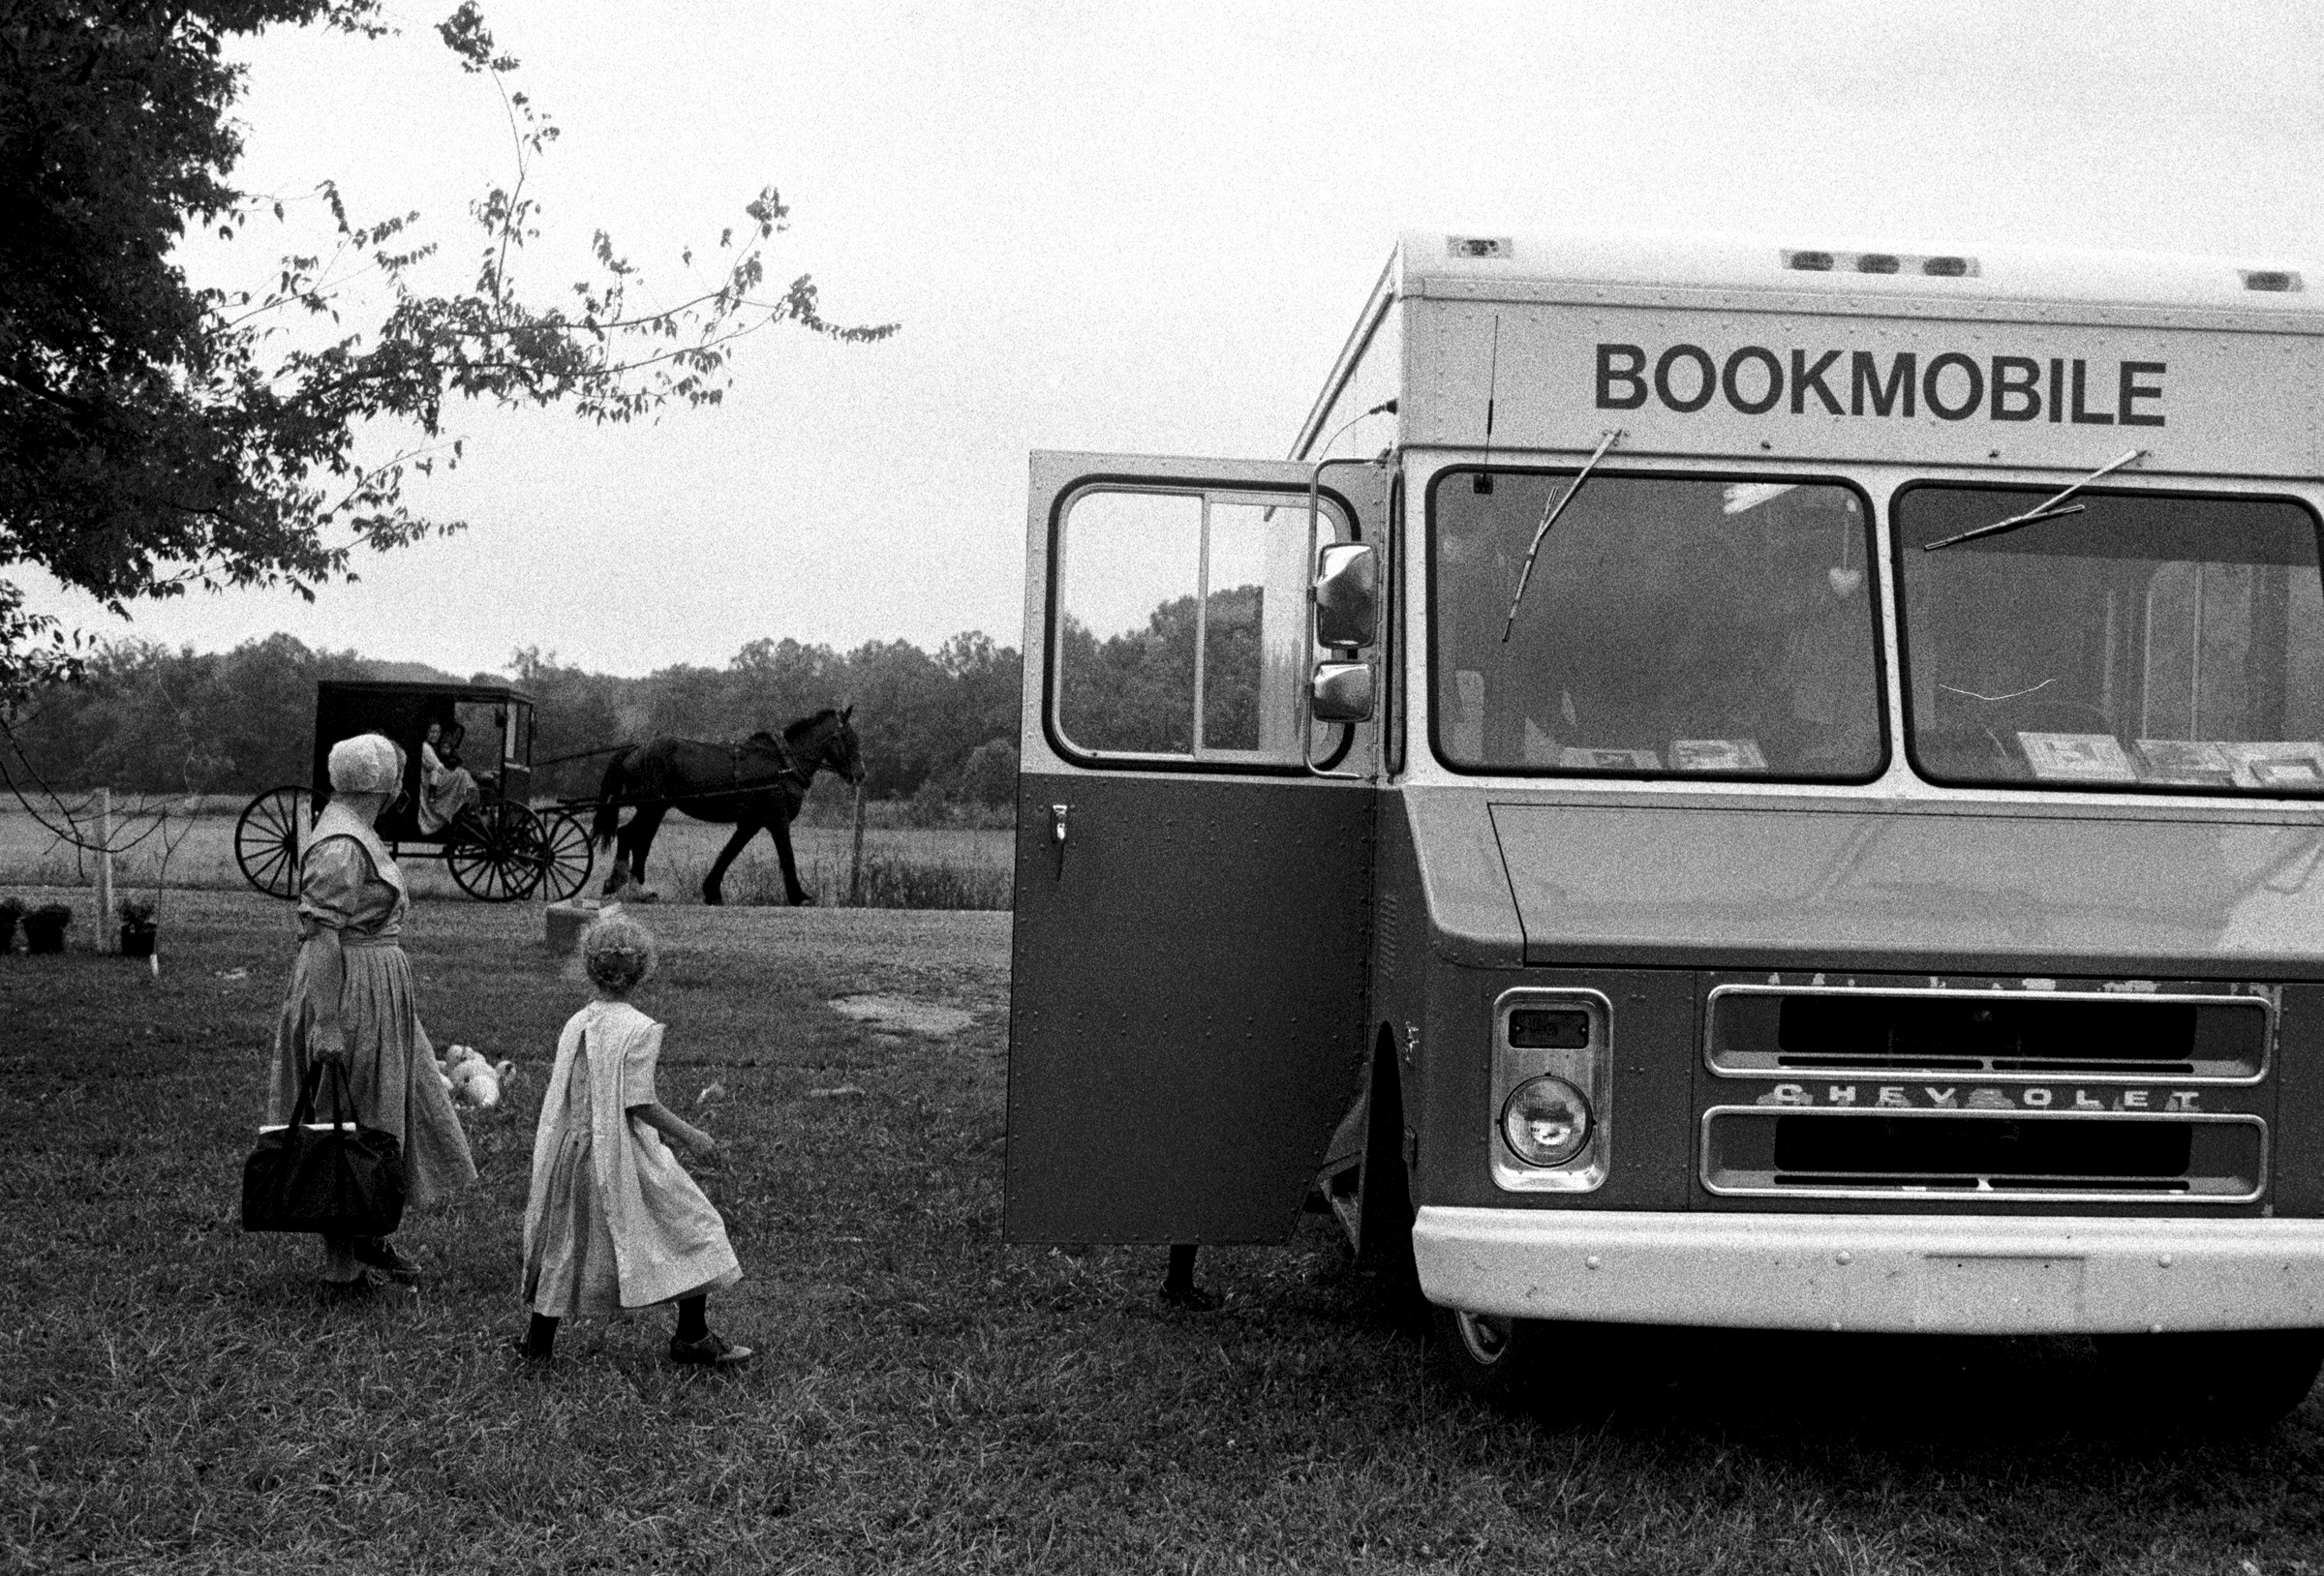 The Bookmobile, Campbellsville, Kentucky.Western Kentucky Mountain People Workshop. © Alicia Hansen